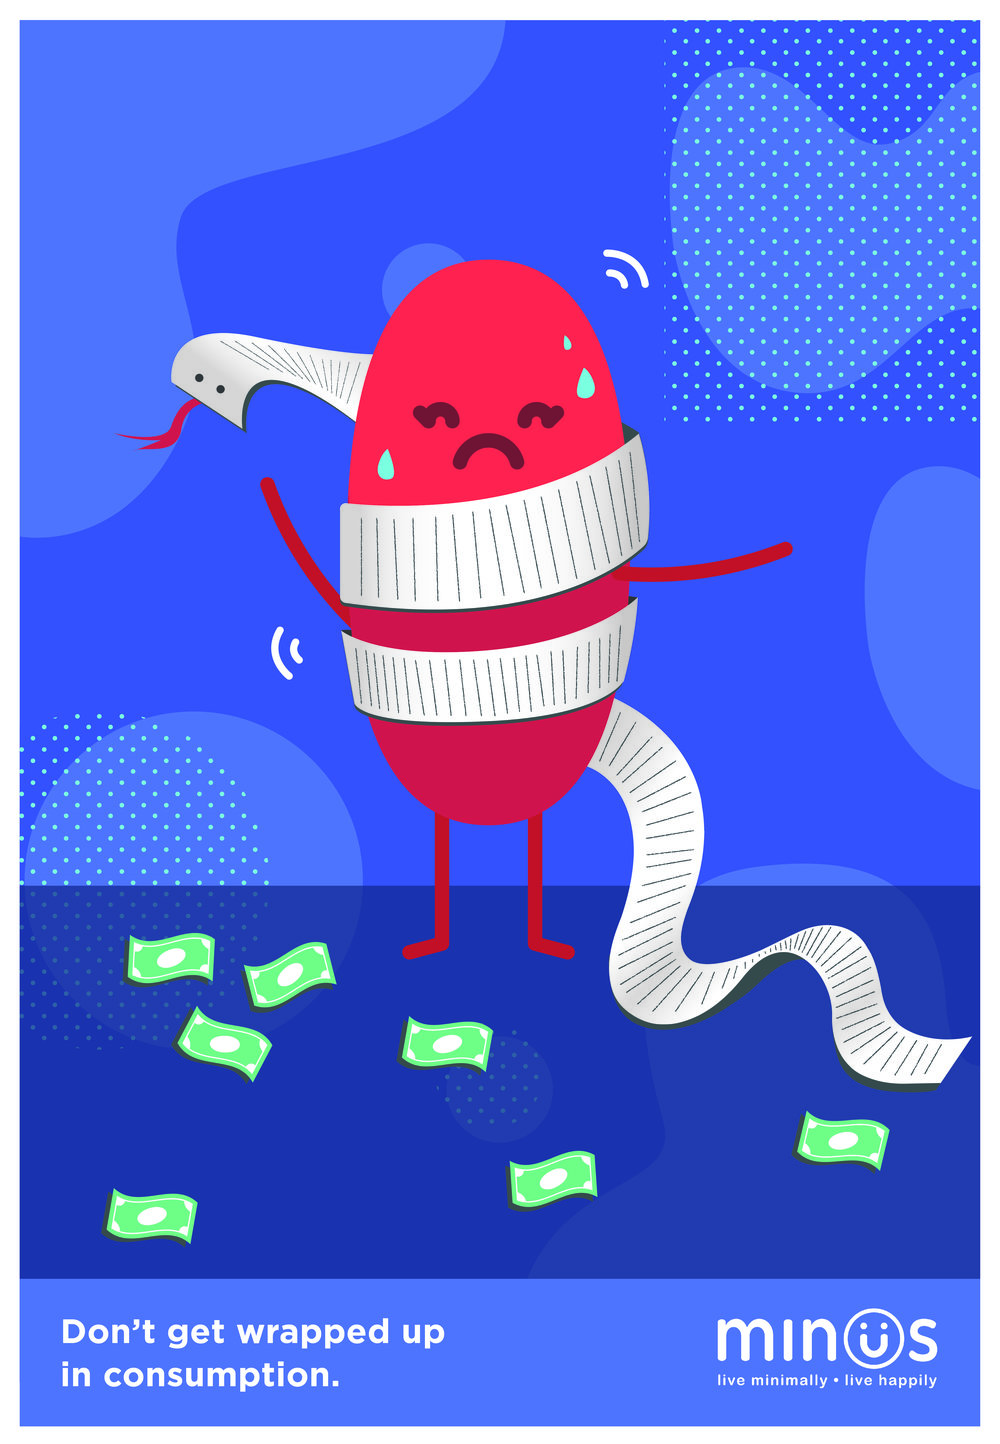 Workspace Clutter + Consumerism_Print_Illustration-02.jpg